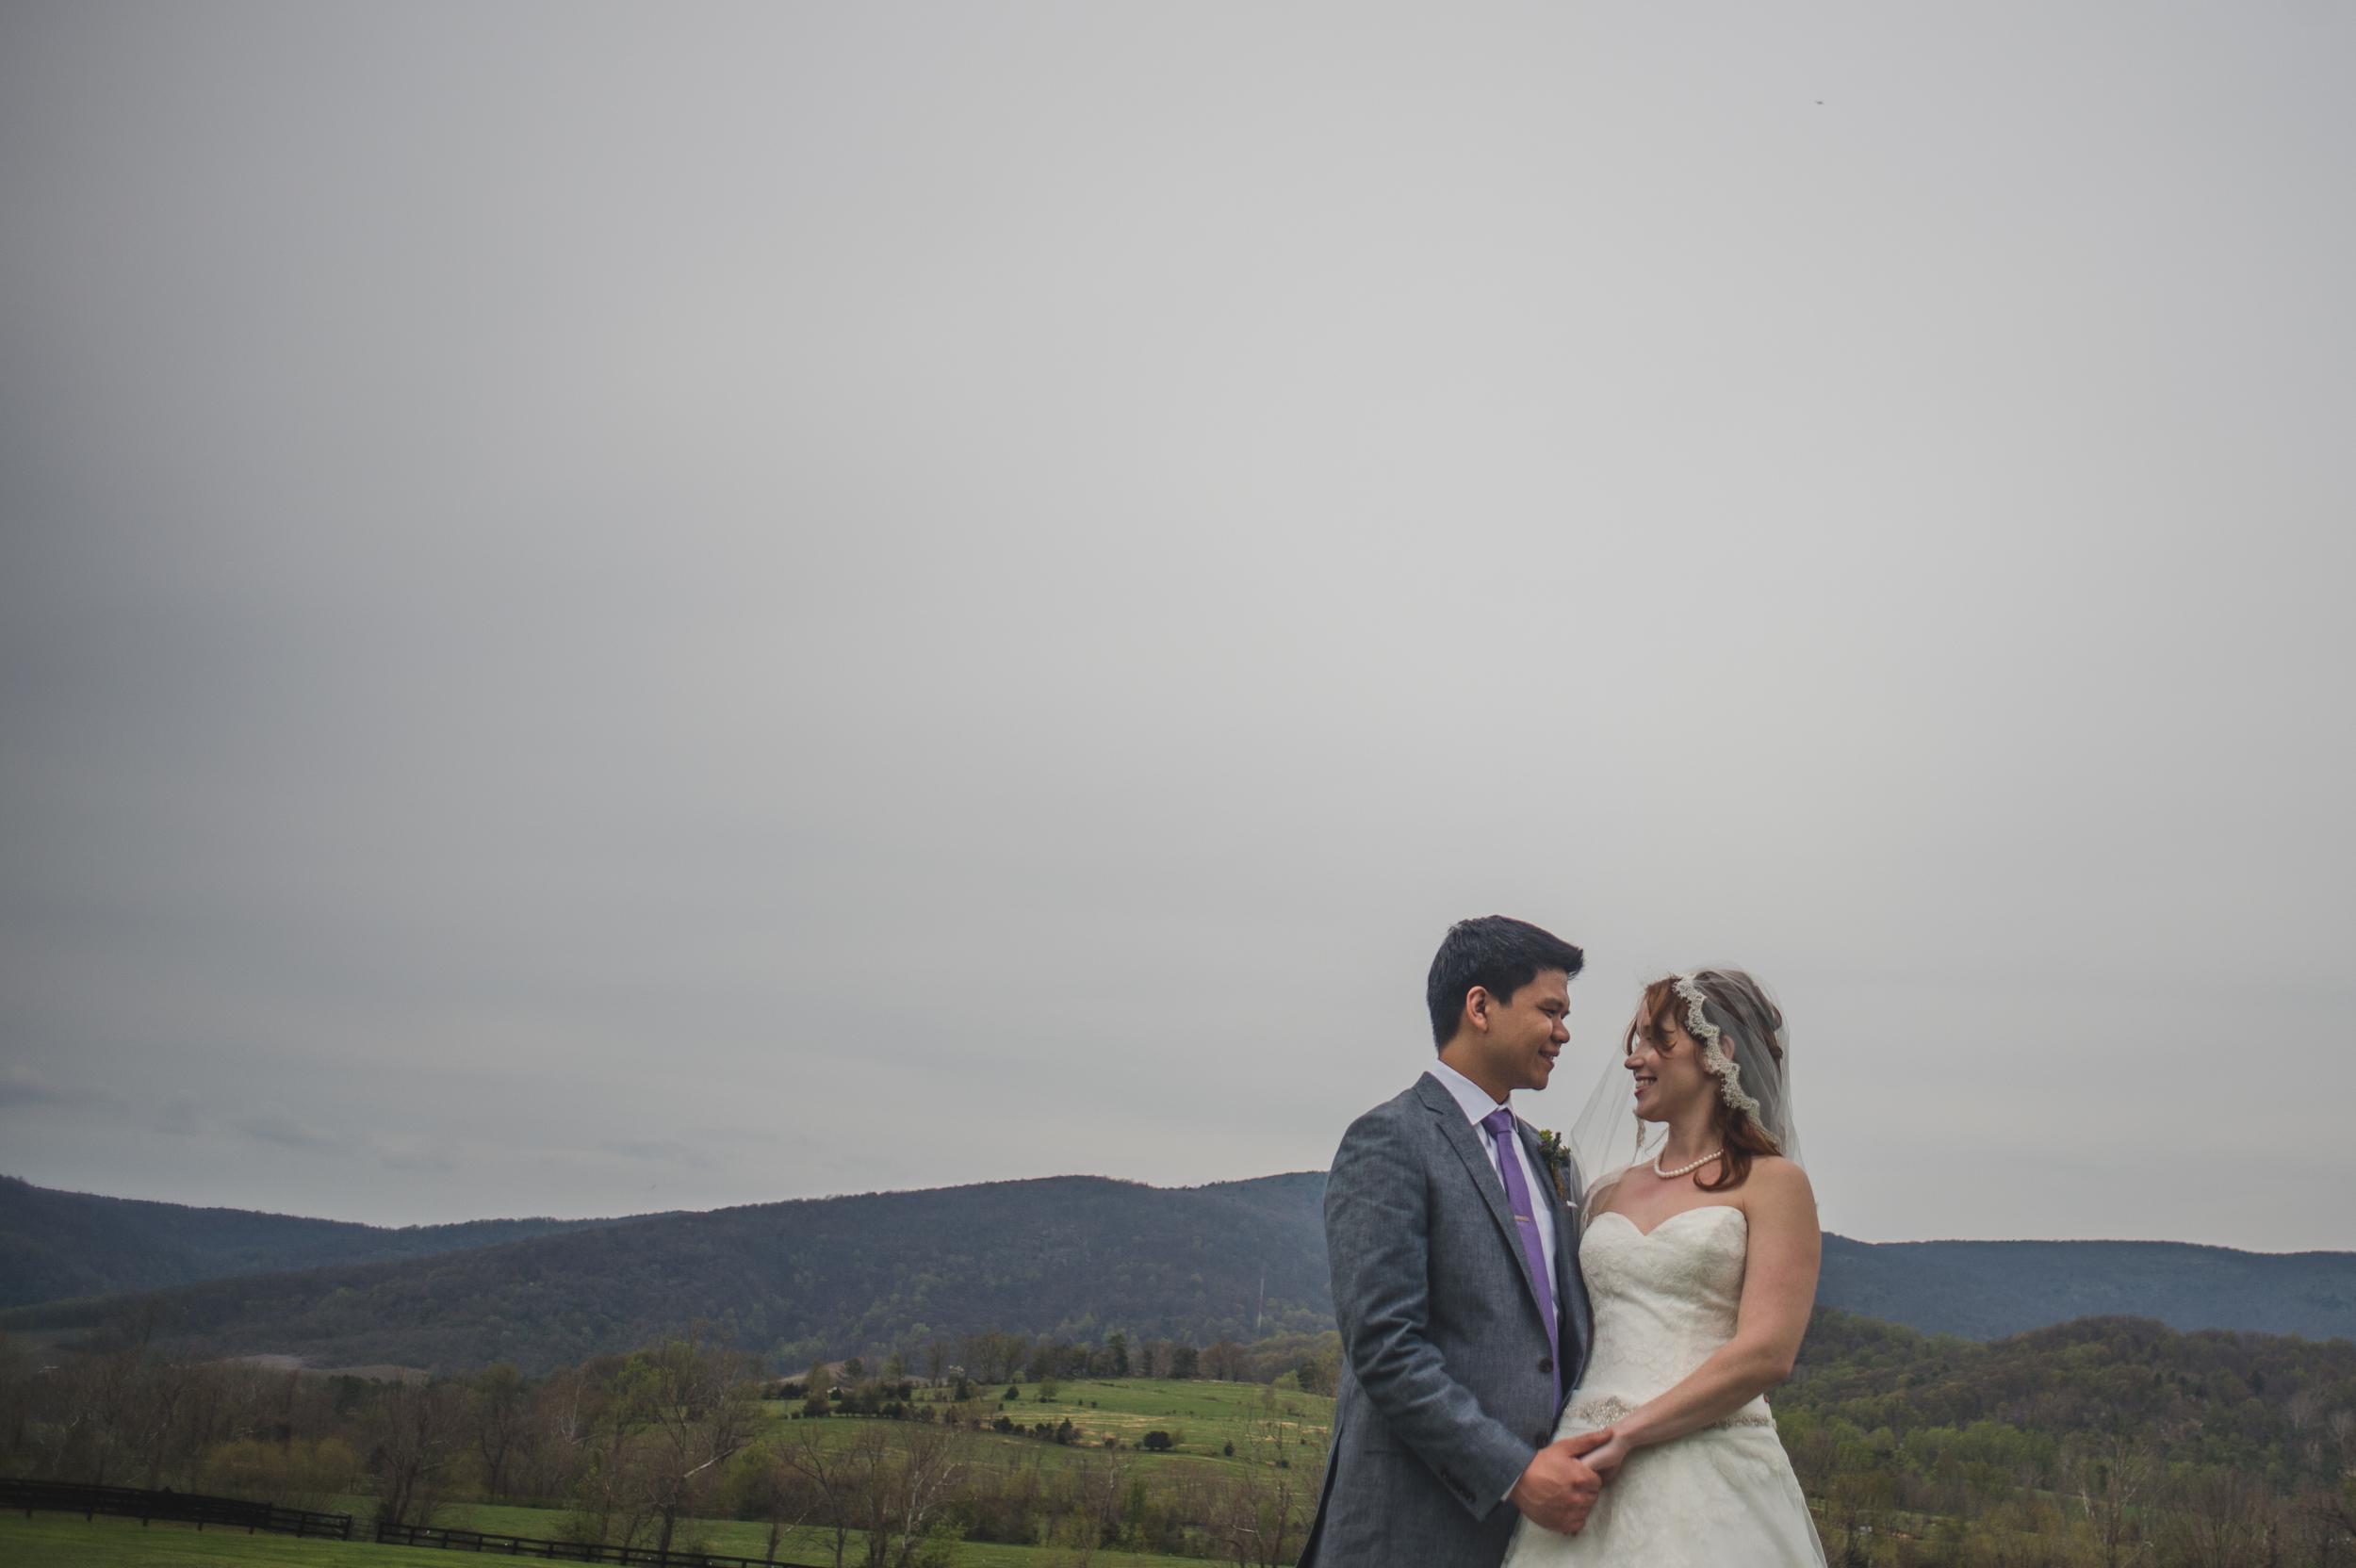 Photojournalistic wedding photography Baltimore MD By Mantas Kubilinskas-7.jpg